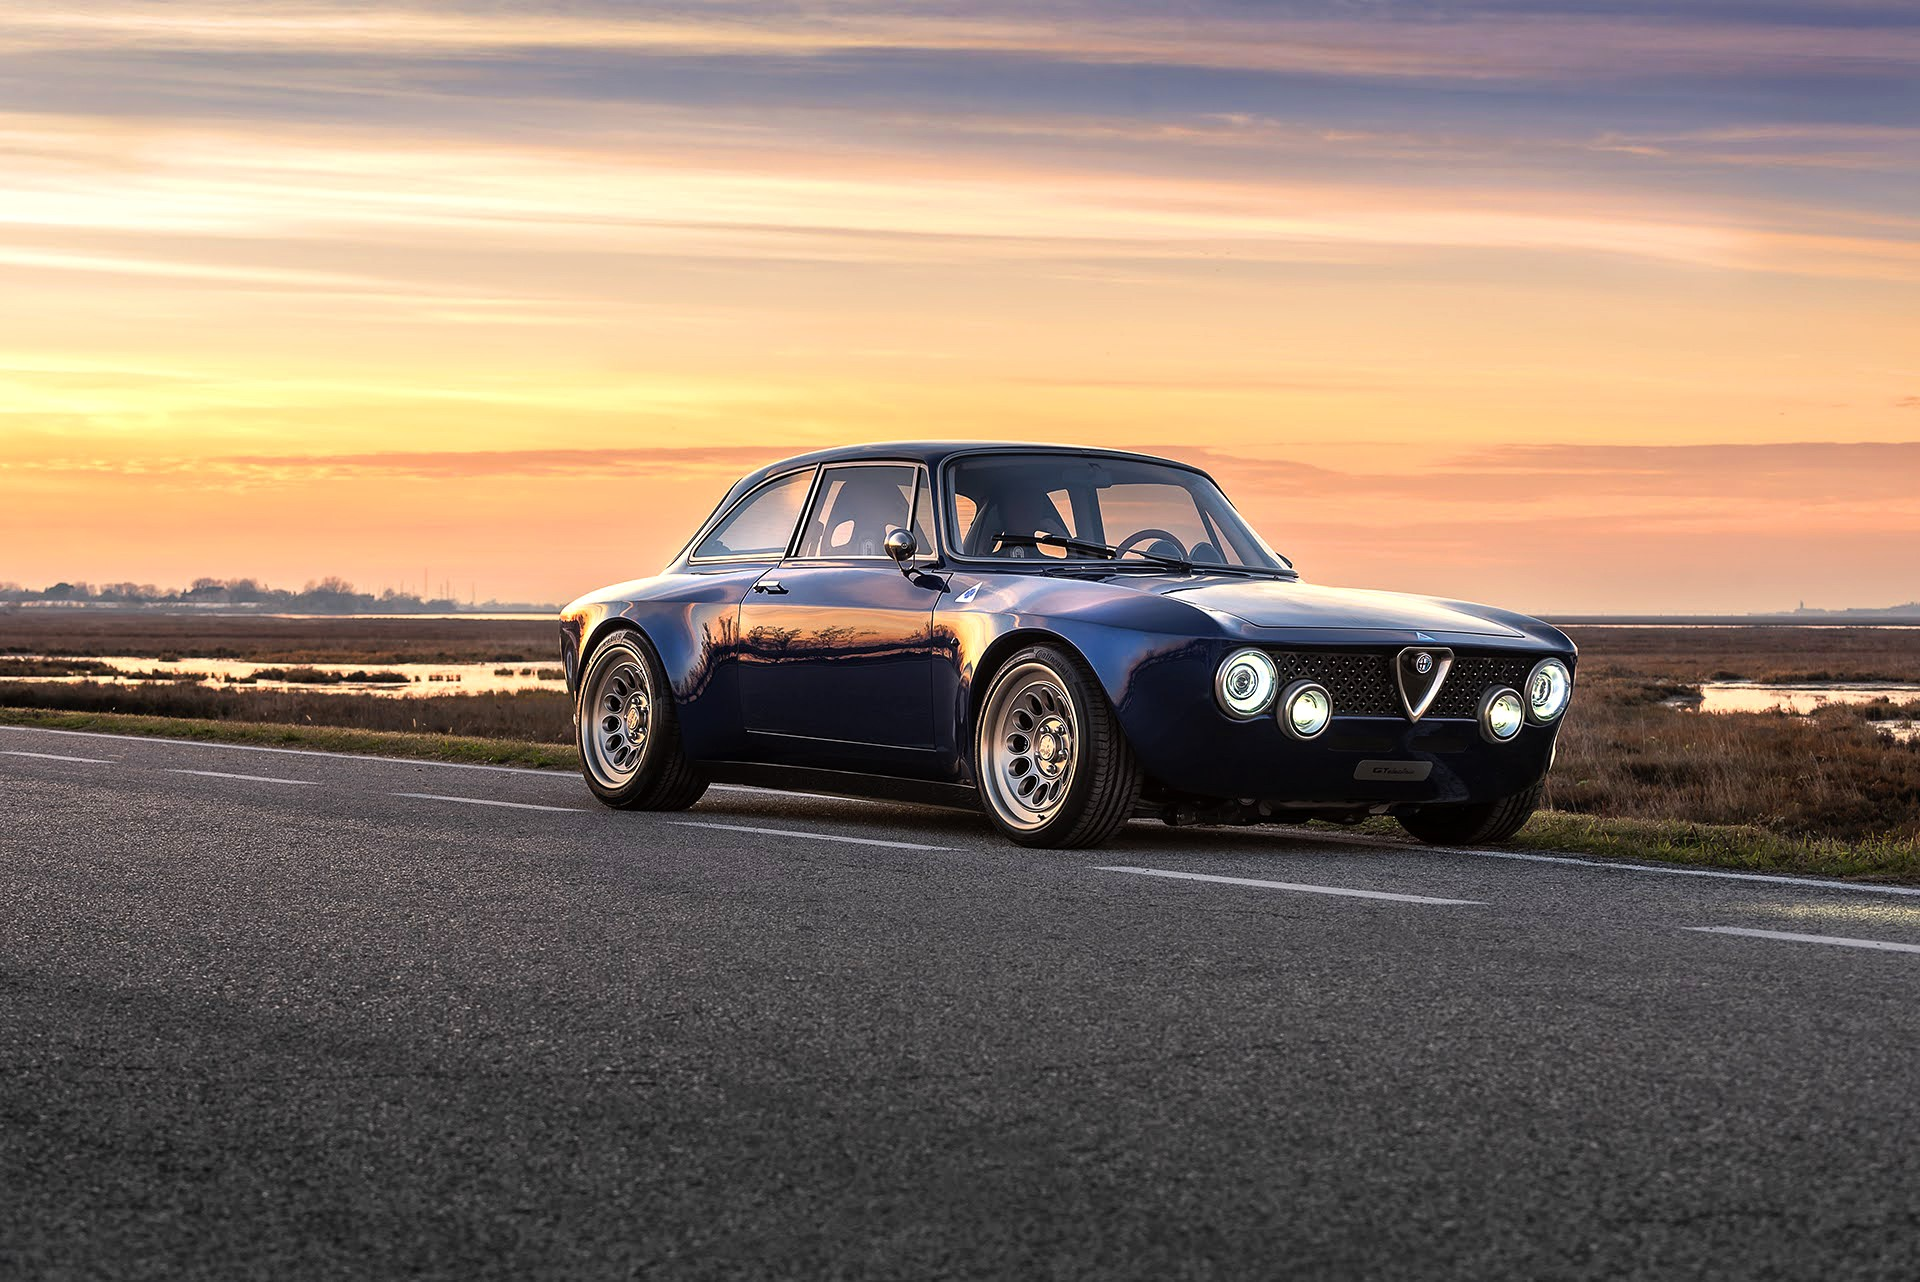 2021-Alfa-Romeo-Giulia-GTA-Totem-GT-Electric-thumb.jpg